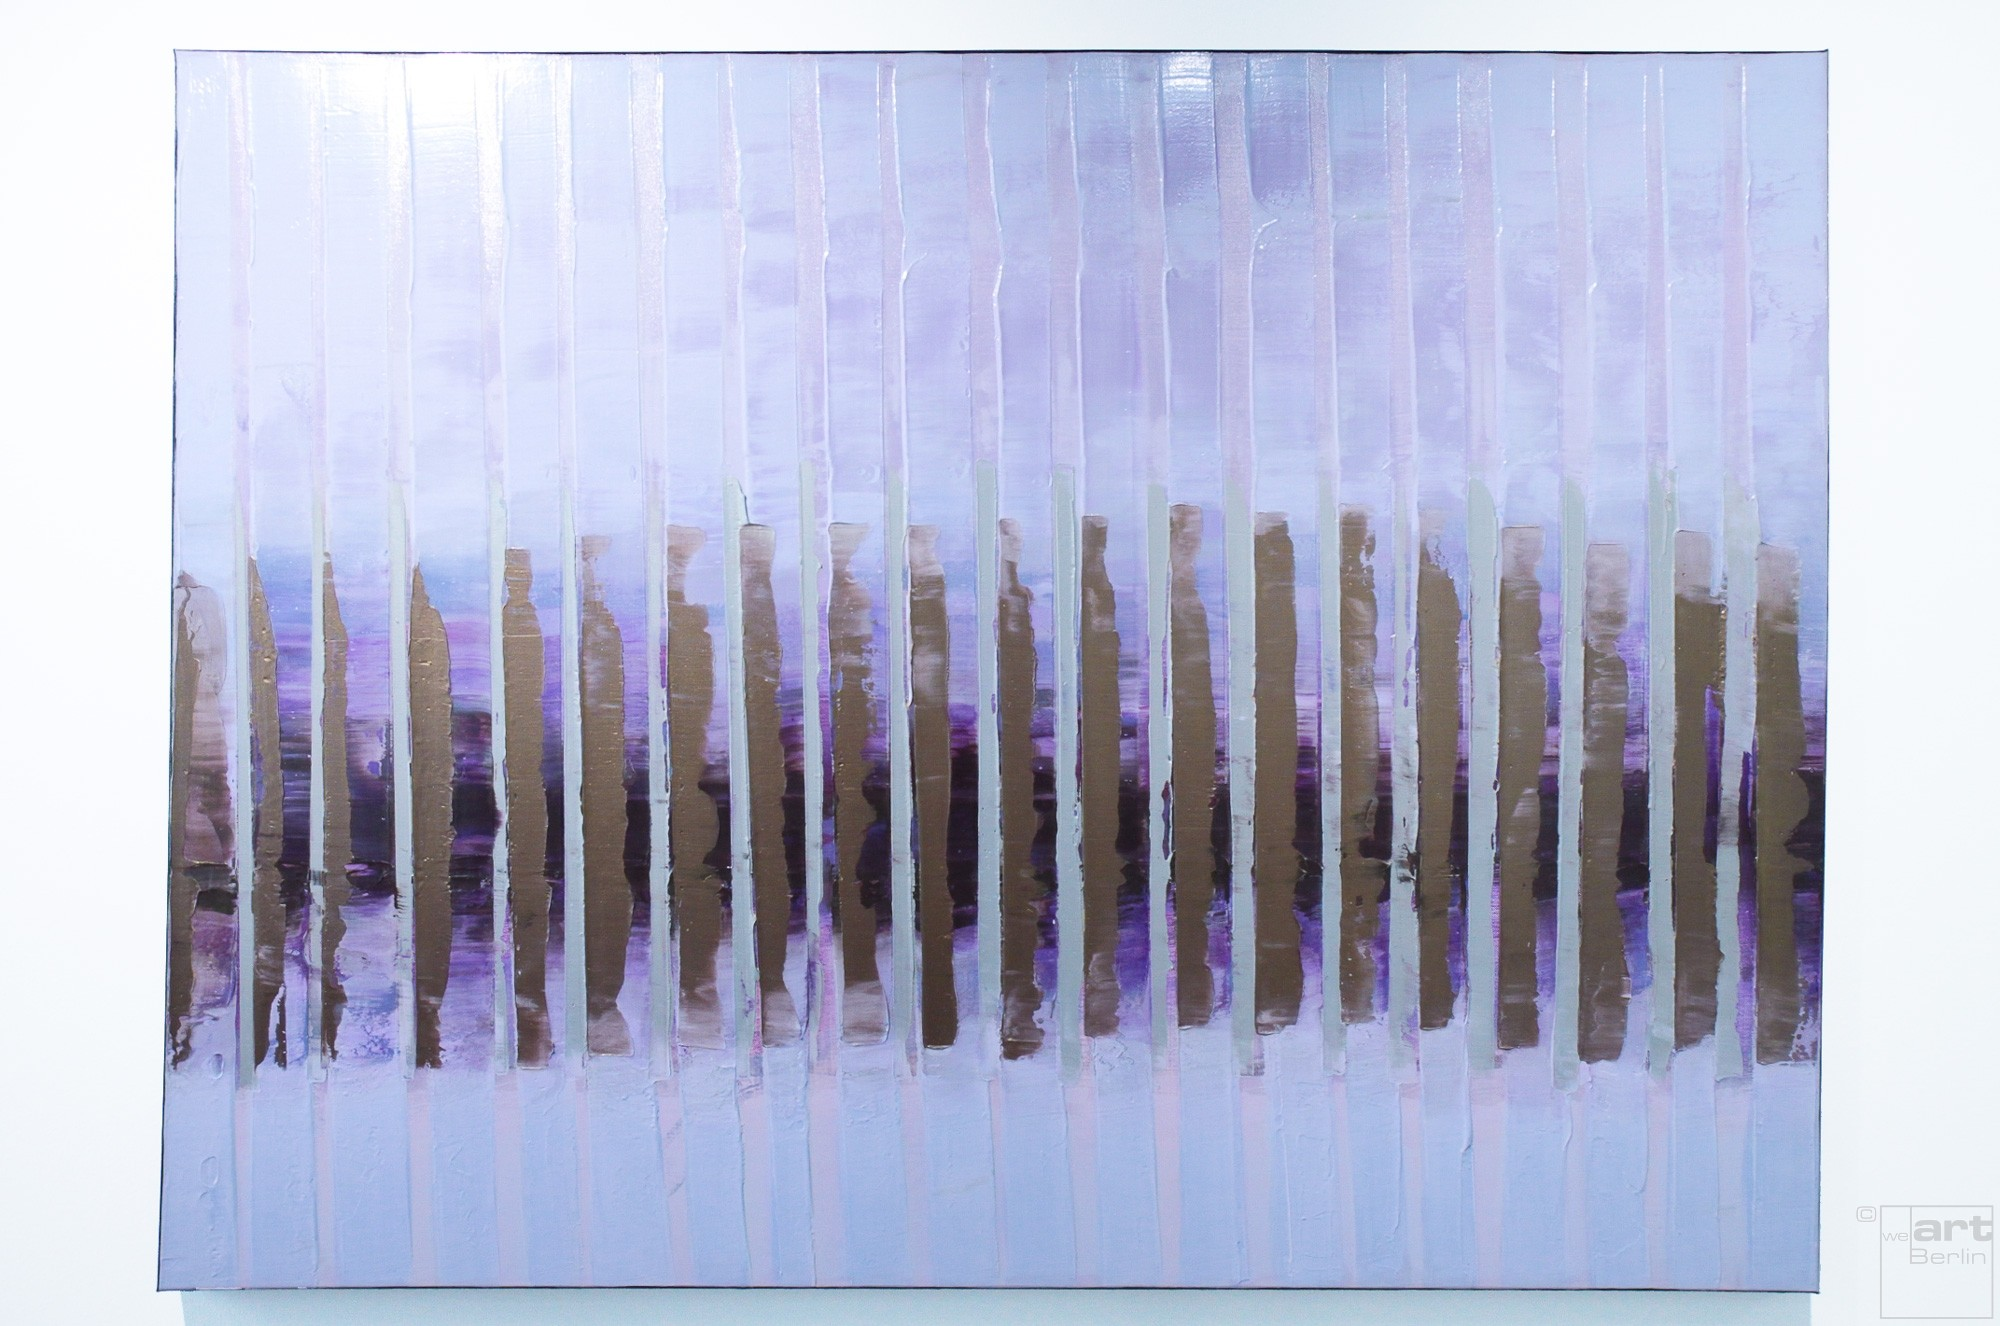 Pink November | Malerei von Lali Torma | Acryl auf Leinwand, abstrakt